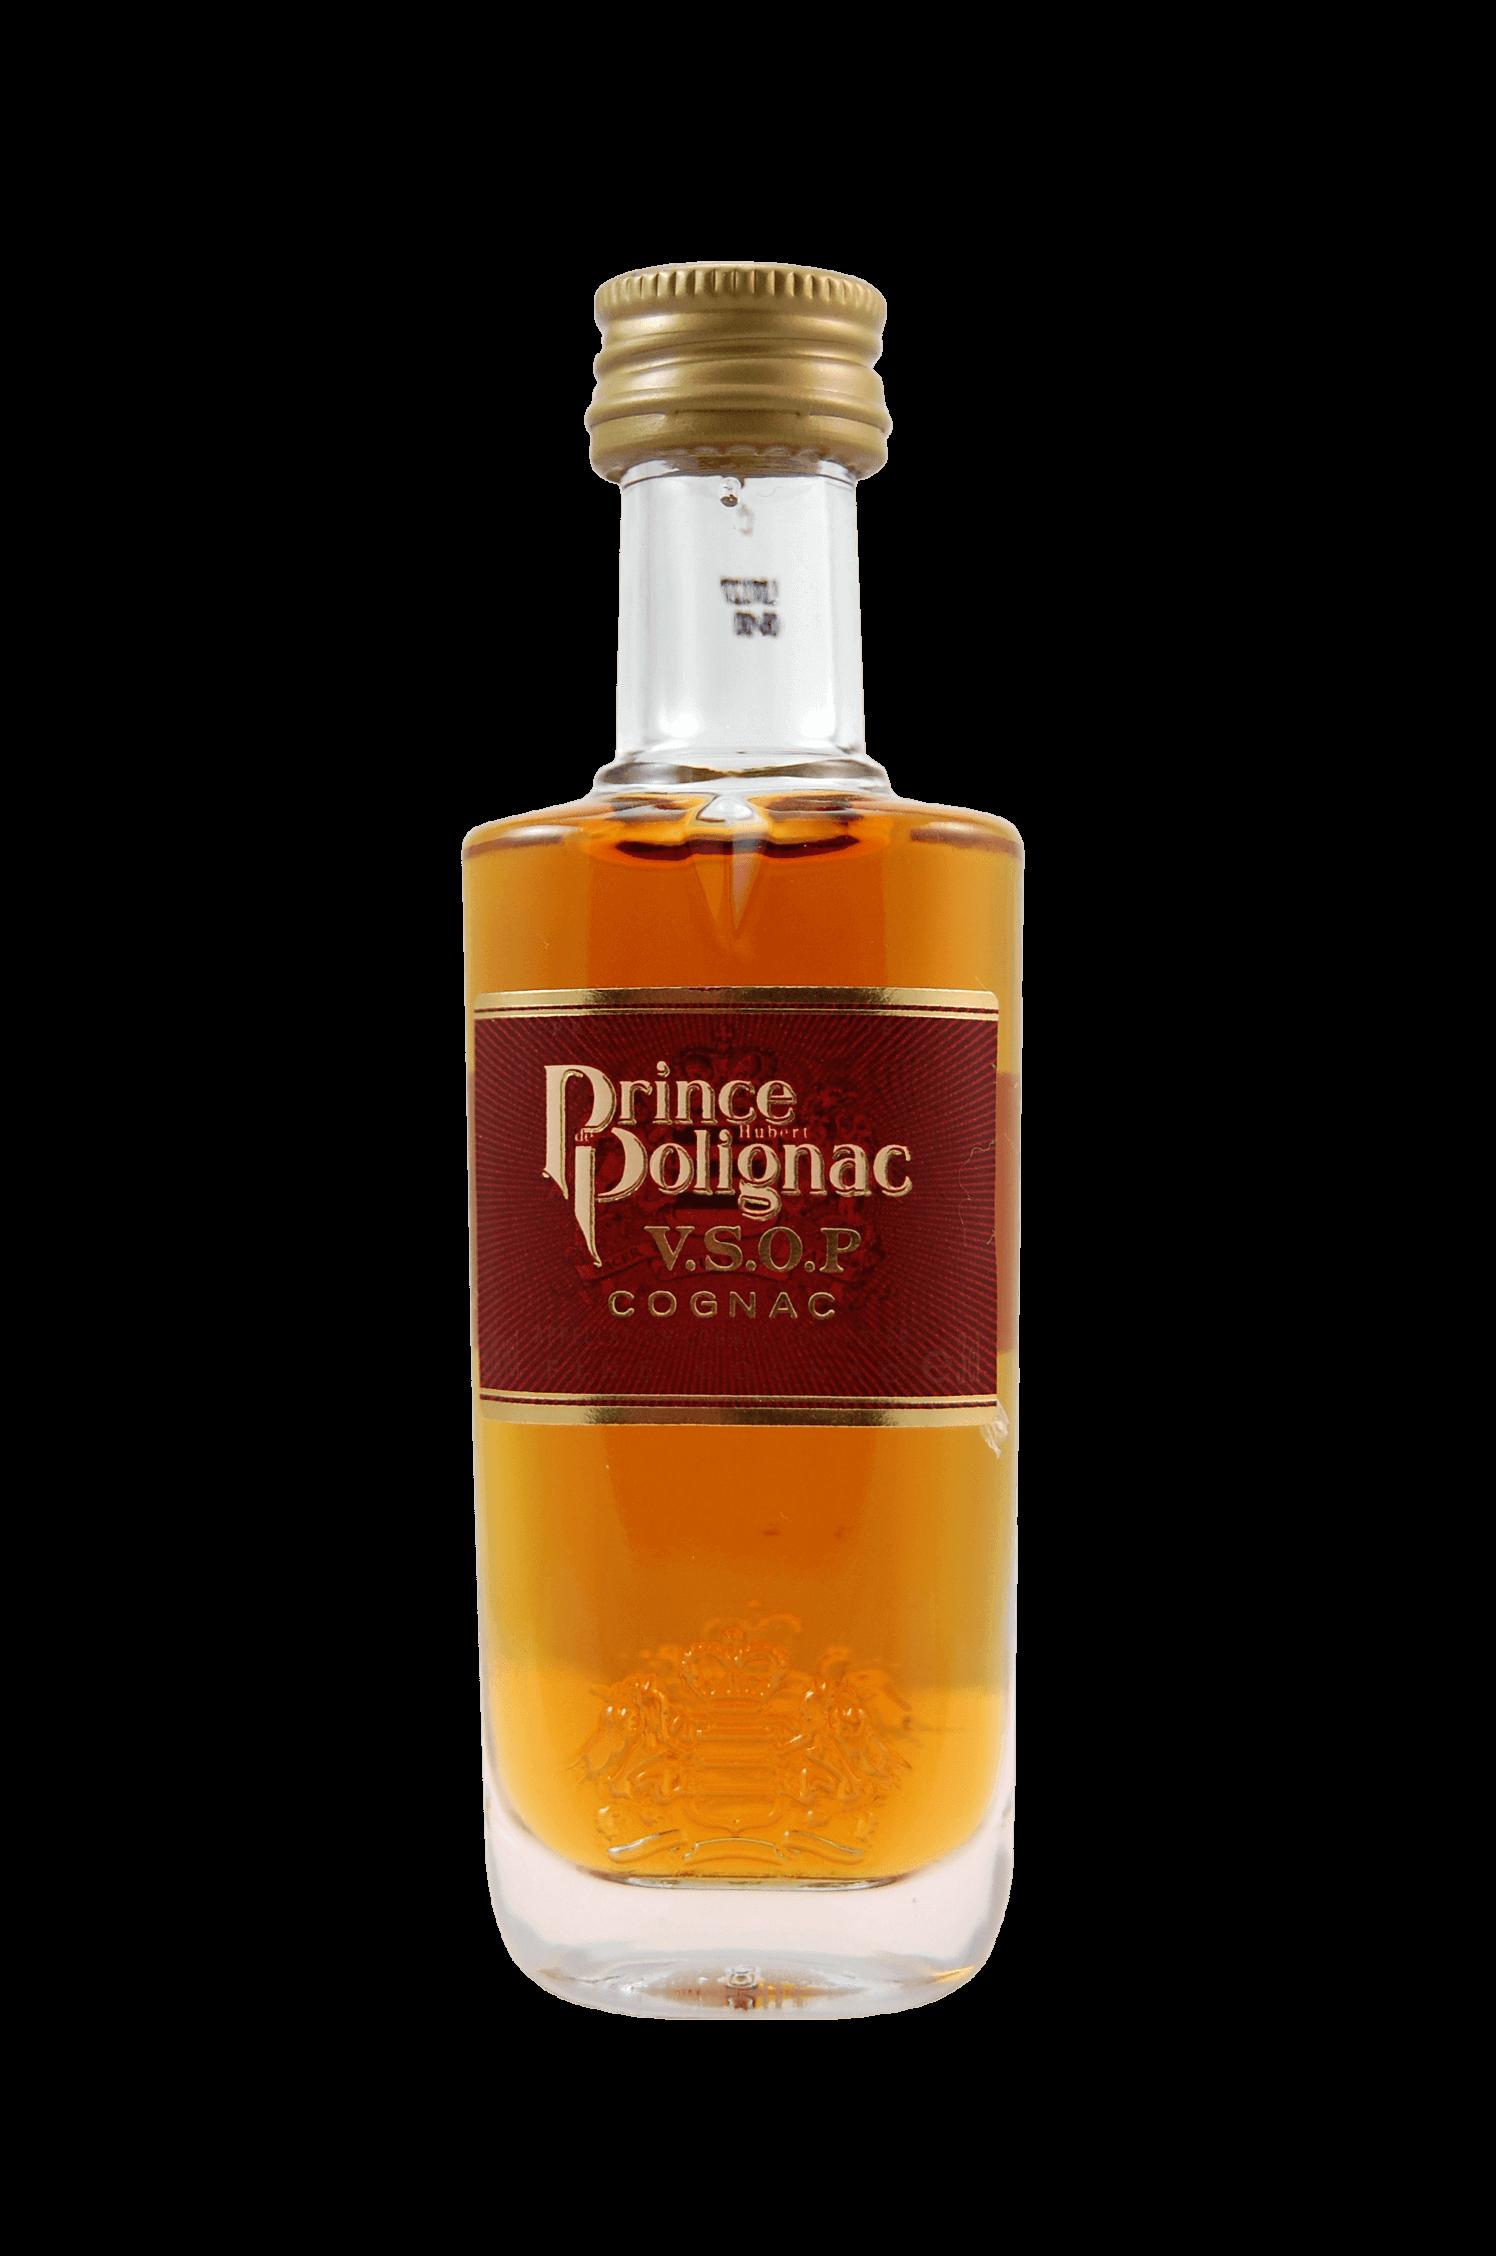 Prince Hubert Polignac V.S.O.P